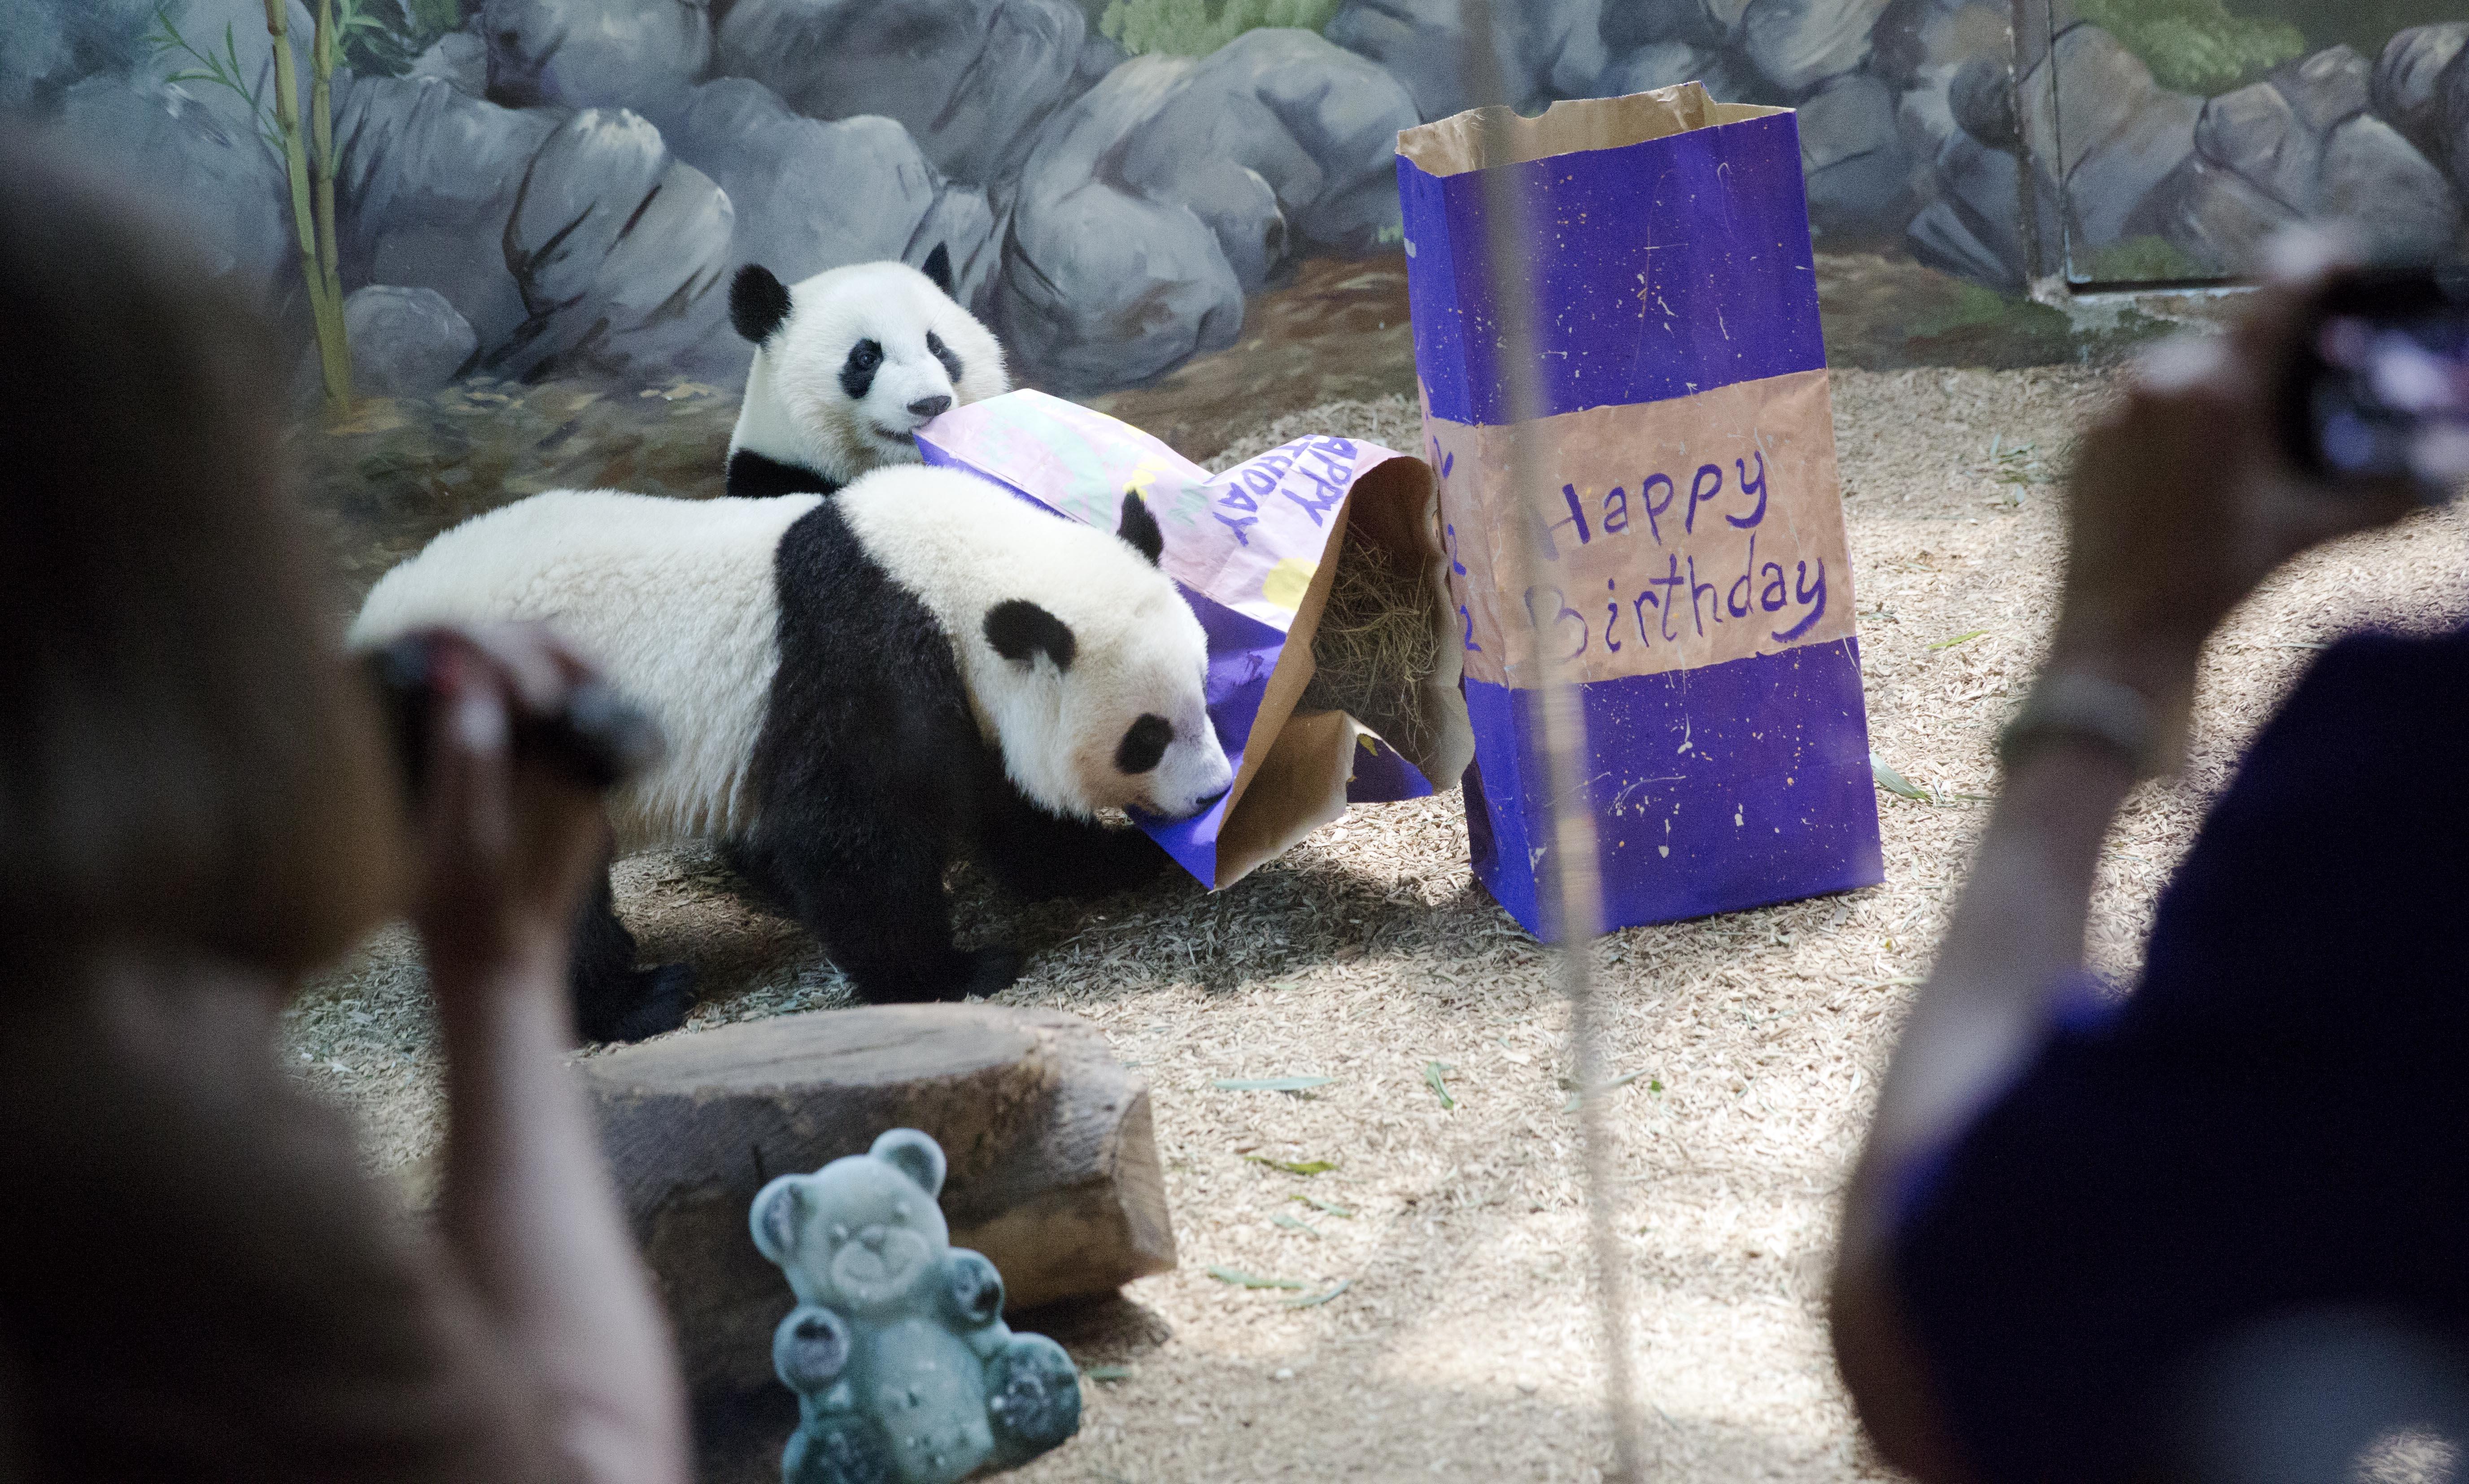 american born panda twins slow in adapting to culture